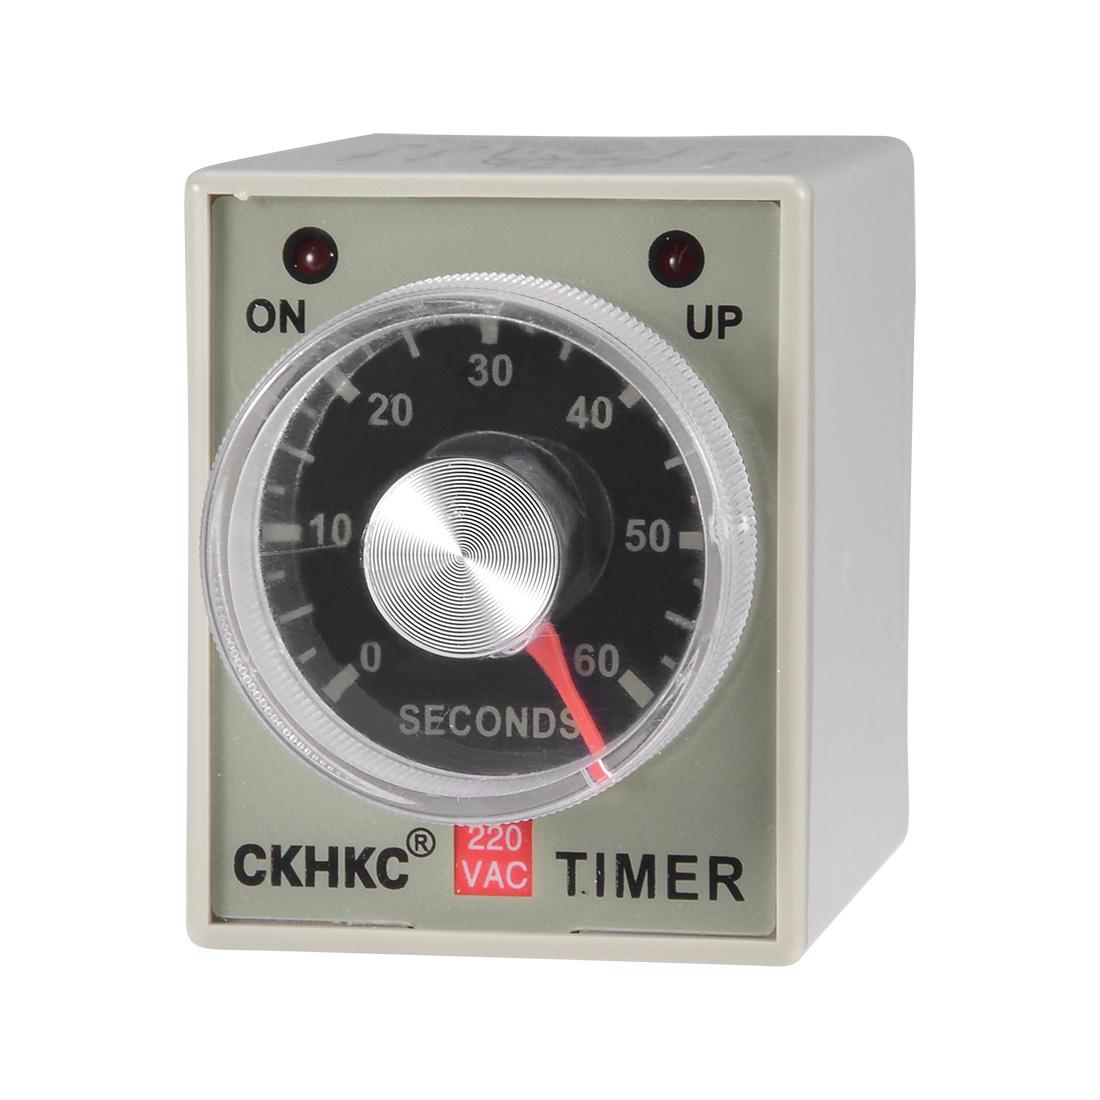 AC220V 60S Time Range 8 Terminals Adjustable Delay Timer Time Relay AH3-3